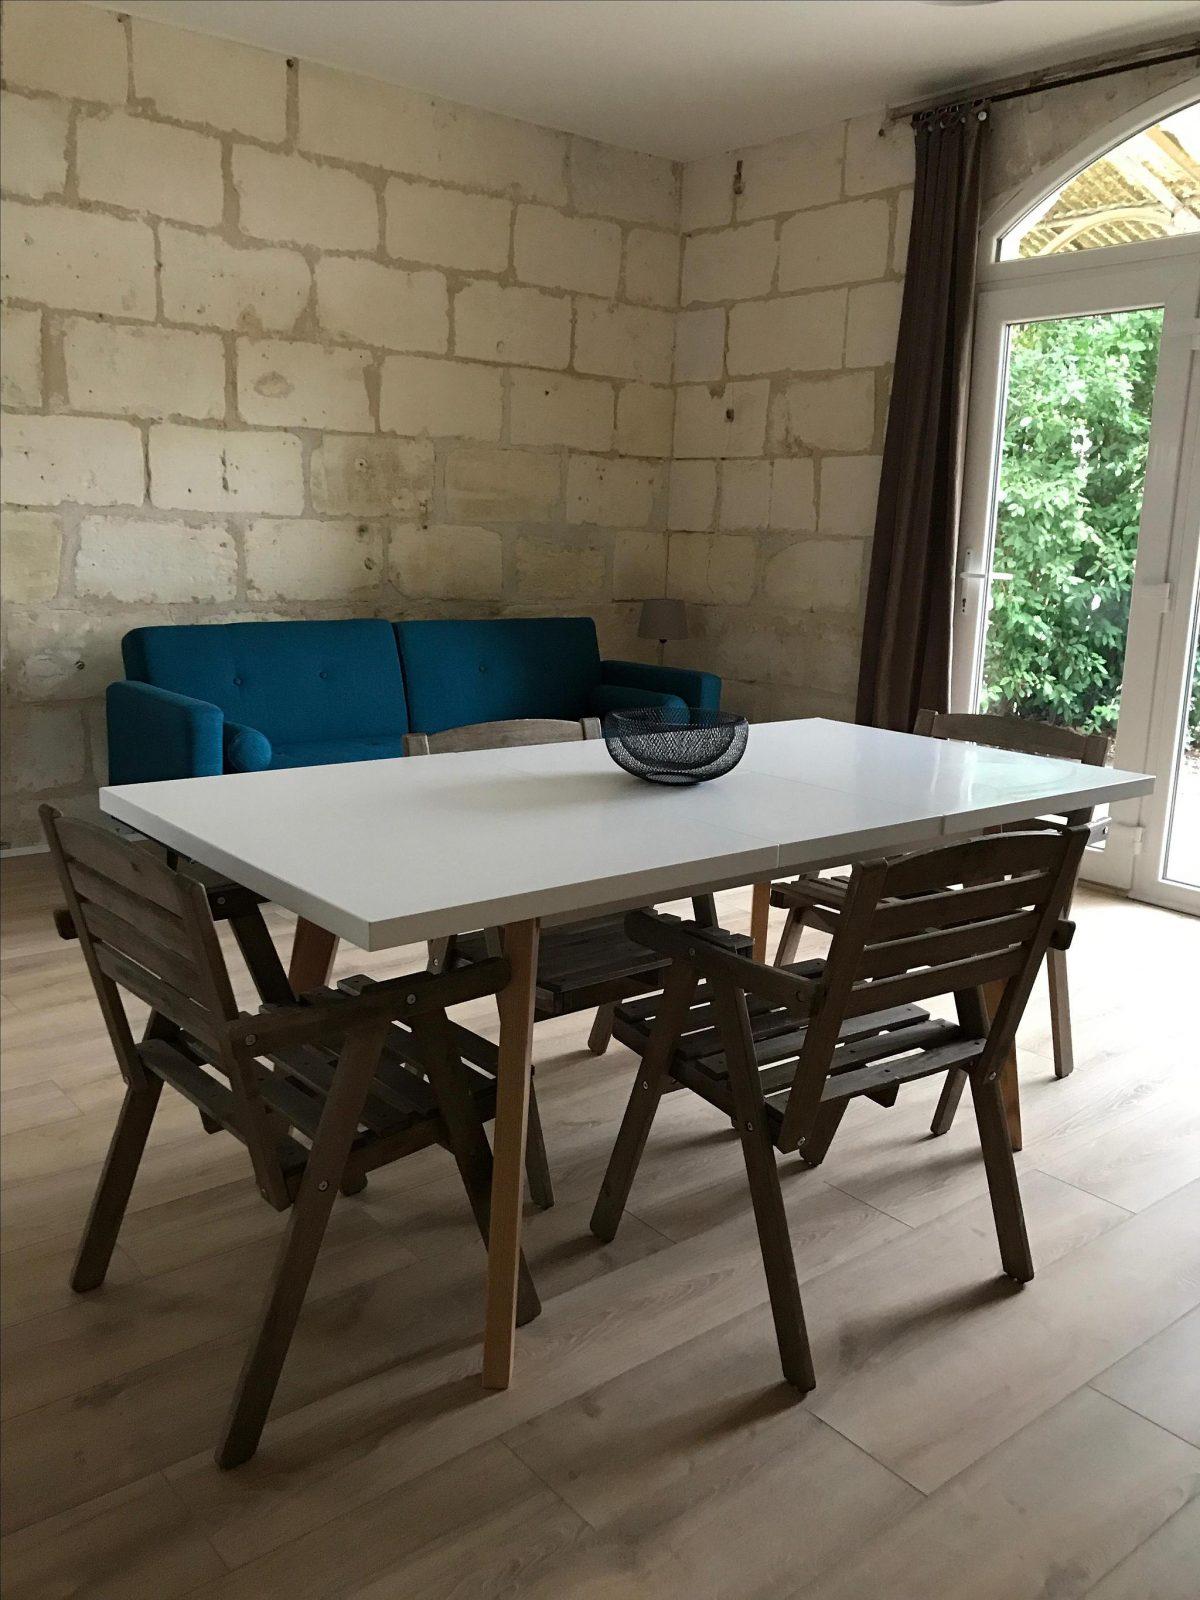 Chateau-La-Fontaine—Rive-Droite–2-